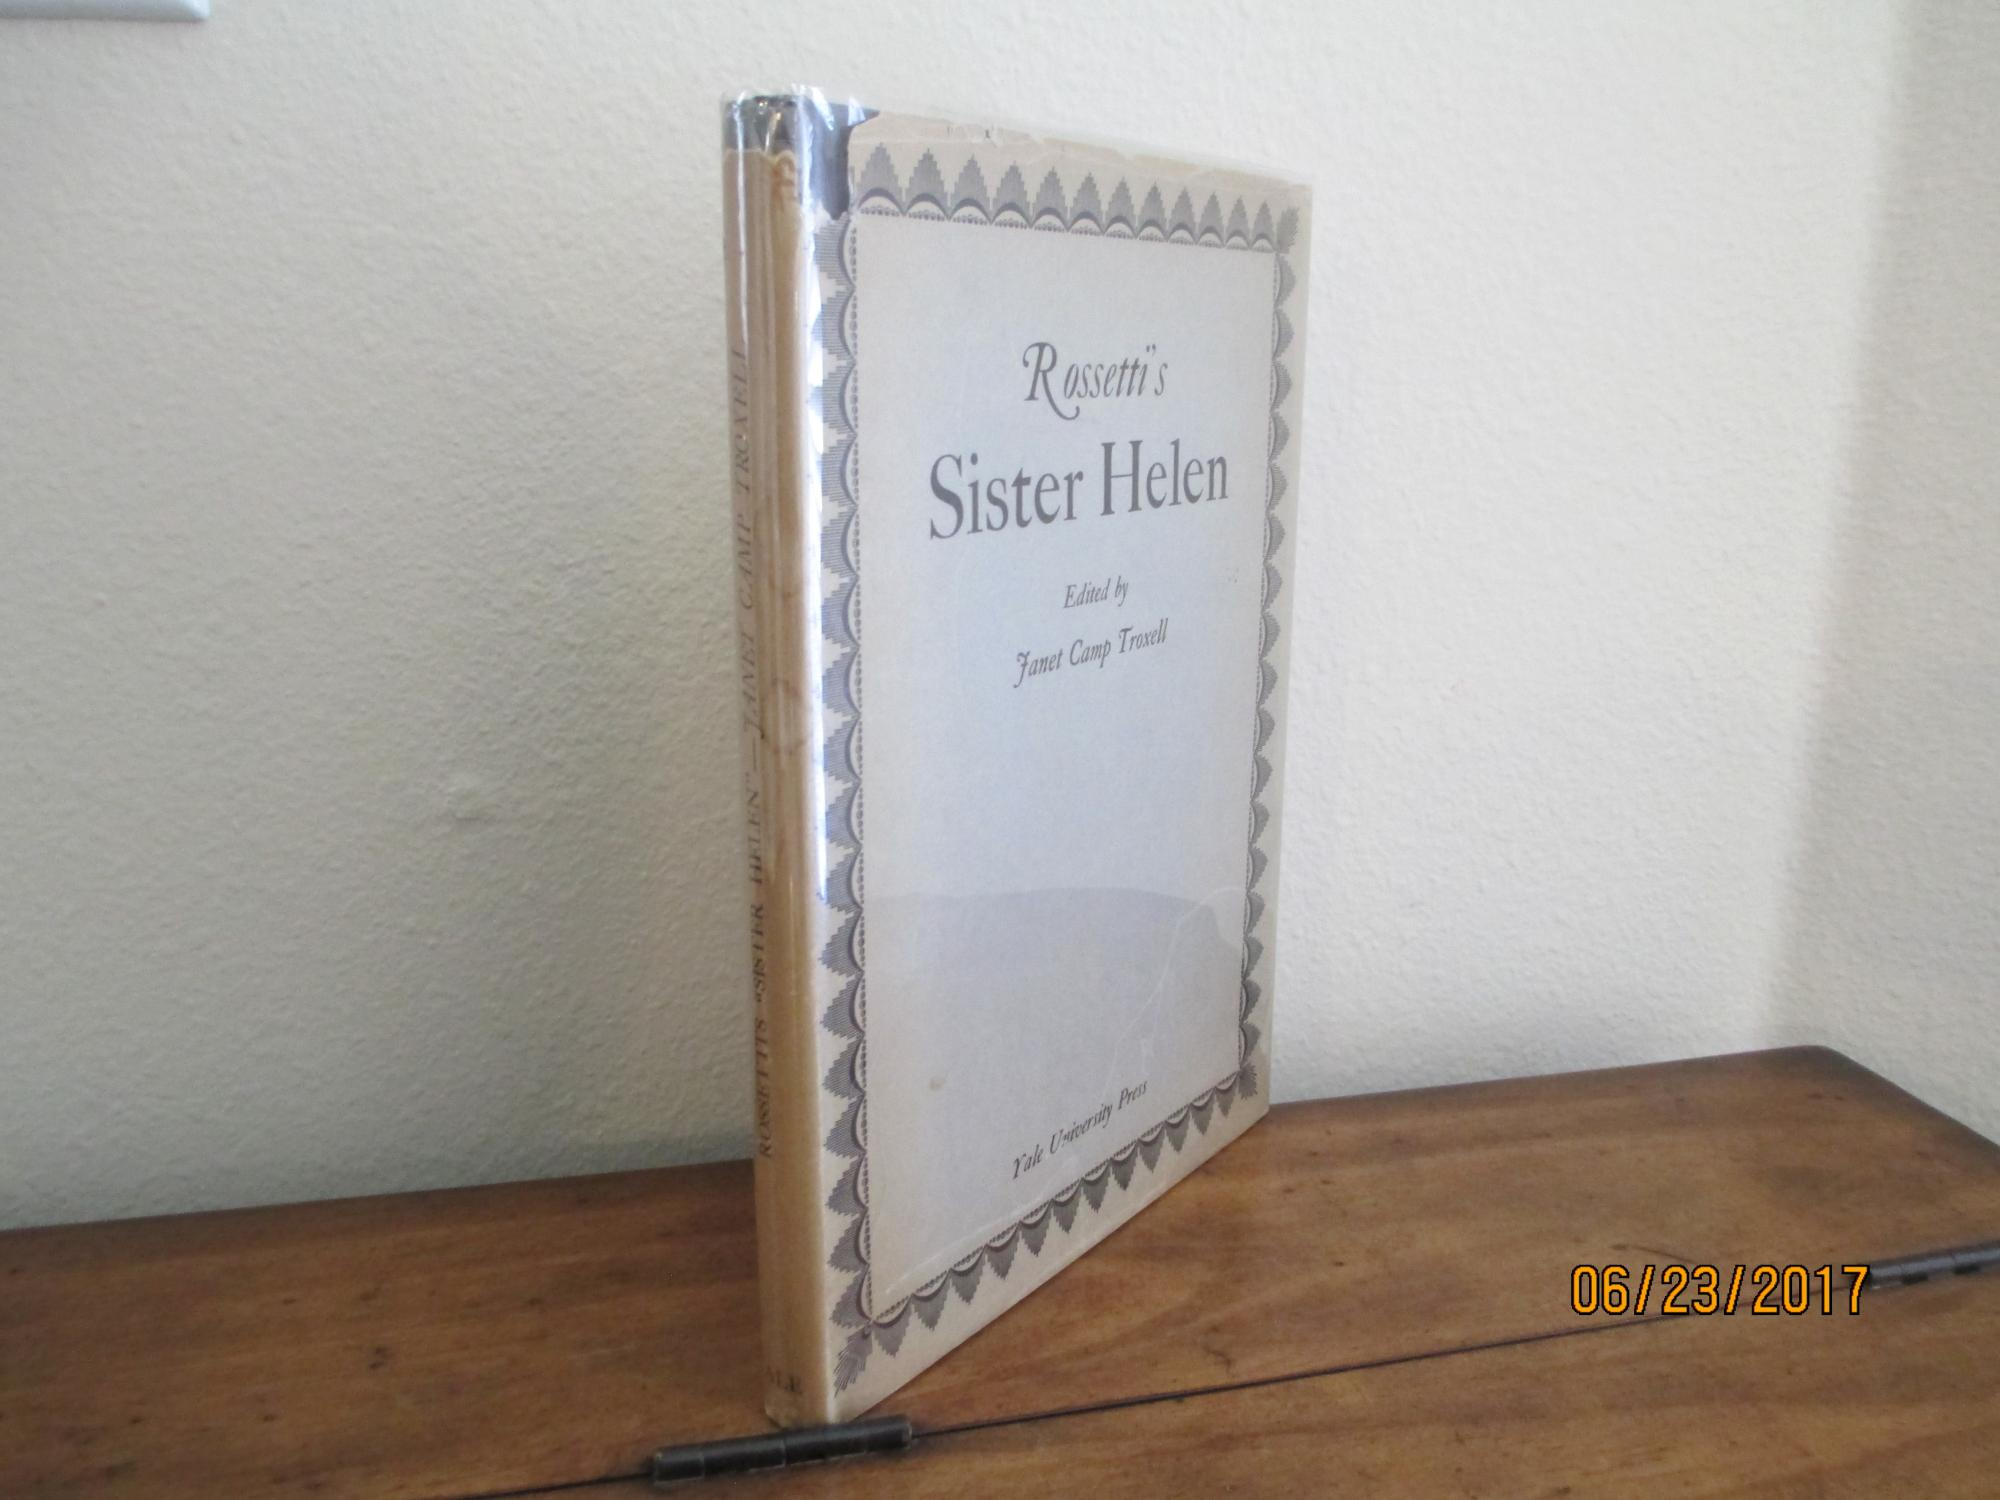 Rossettis_Sister_Helen_Troxell_Janet_Camp_Editor_Très_bon_Couverture_rigide